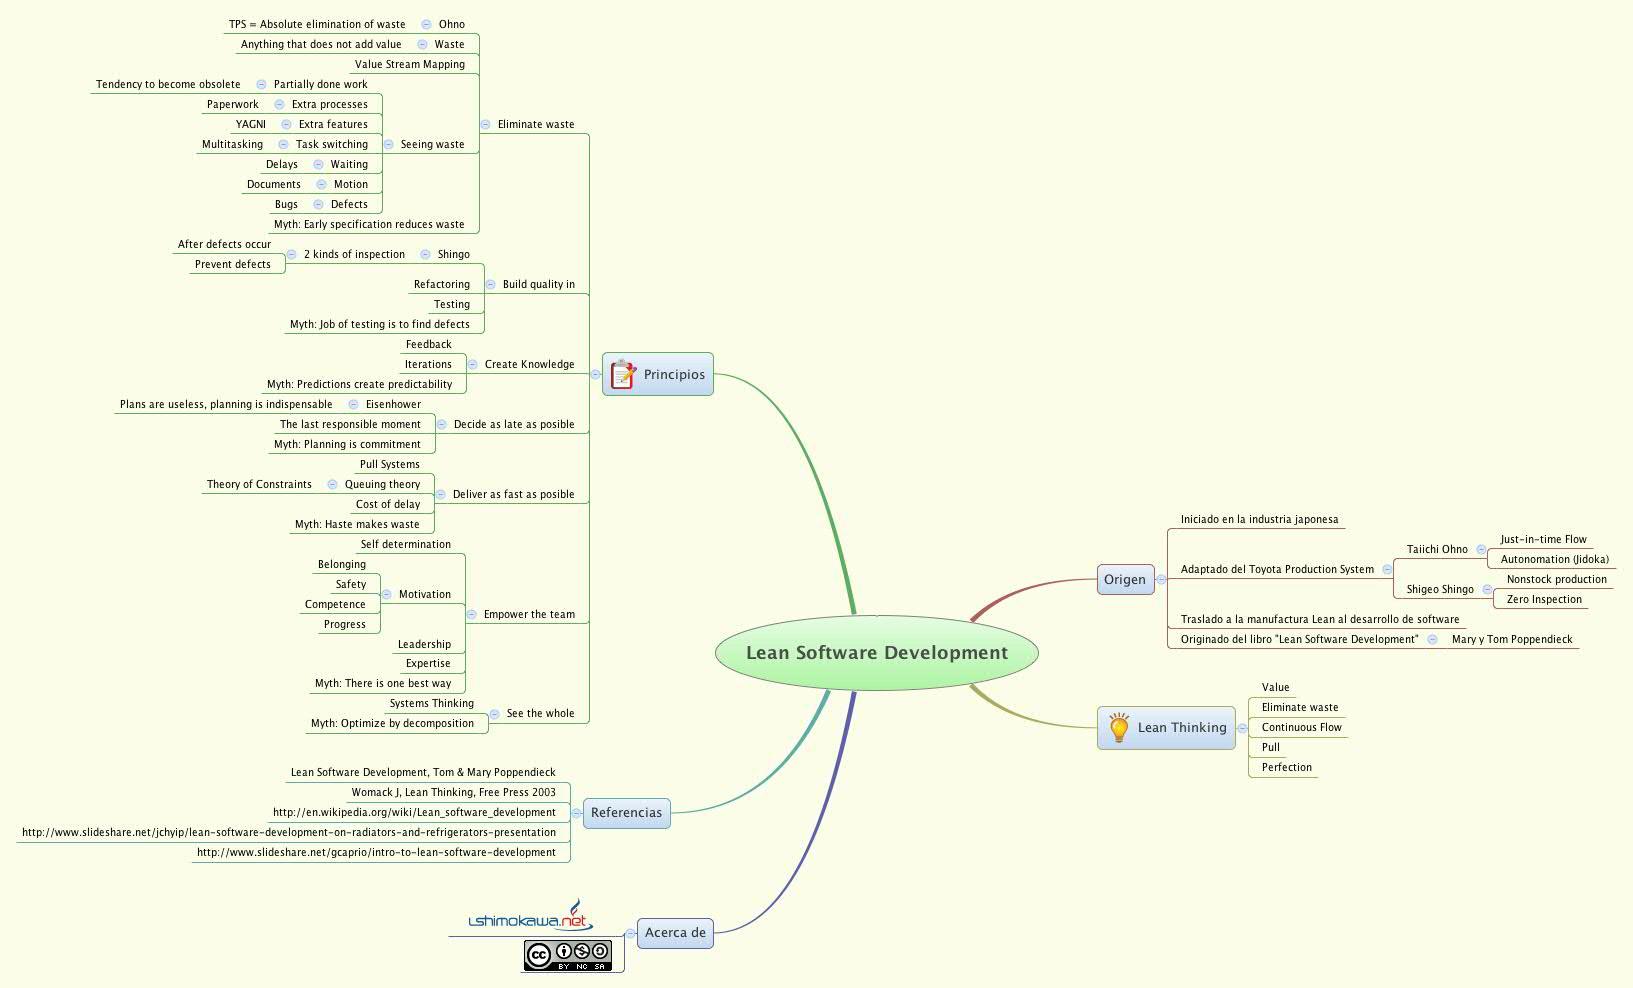 Lean Software Development -- XMind Online Library